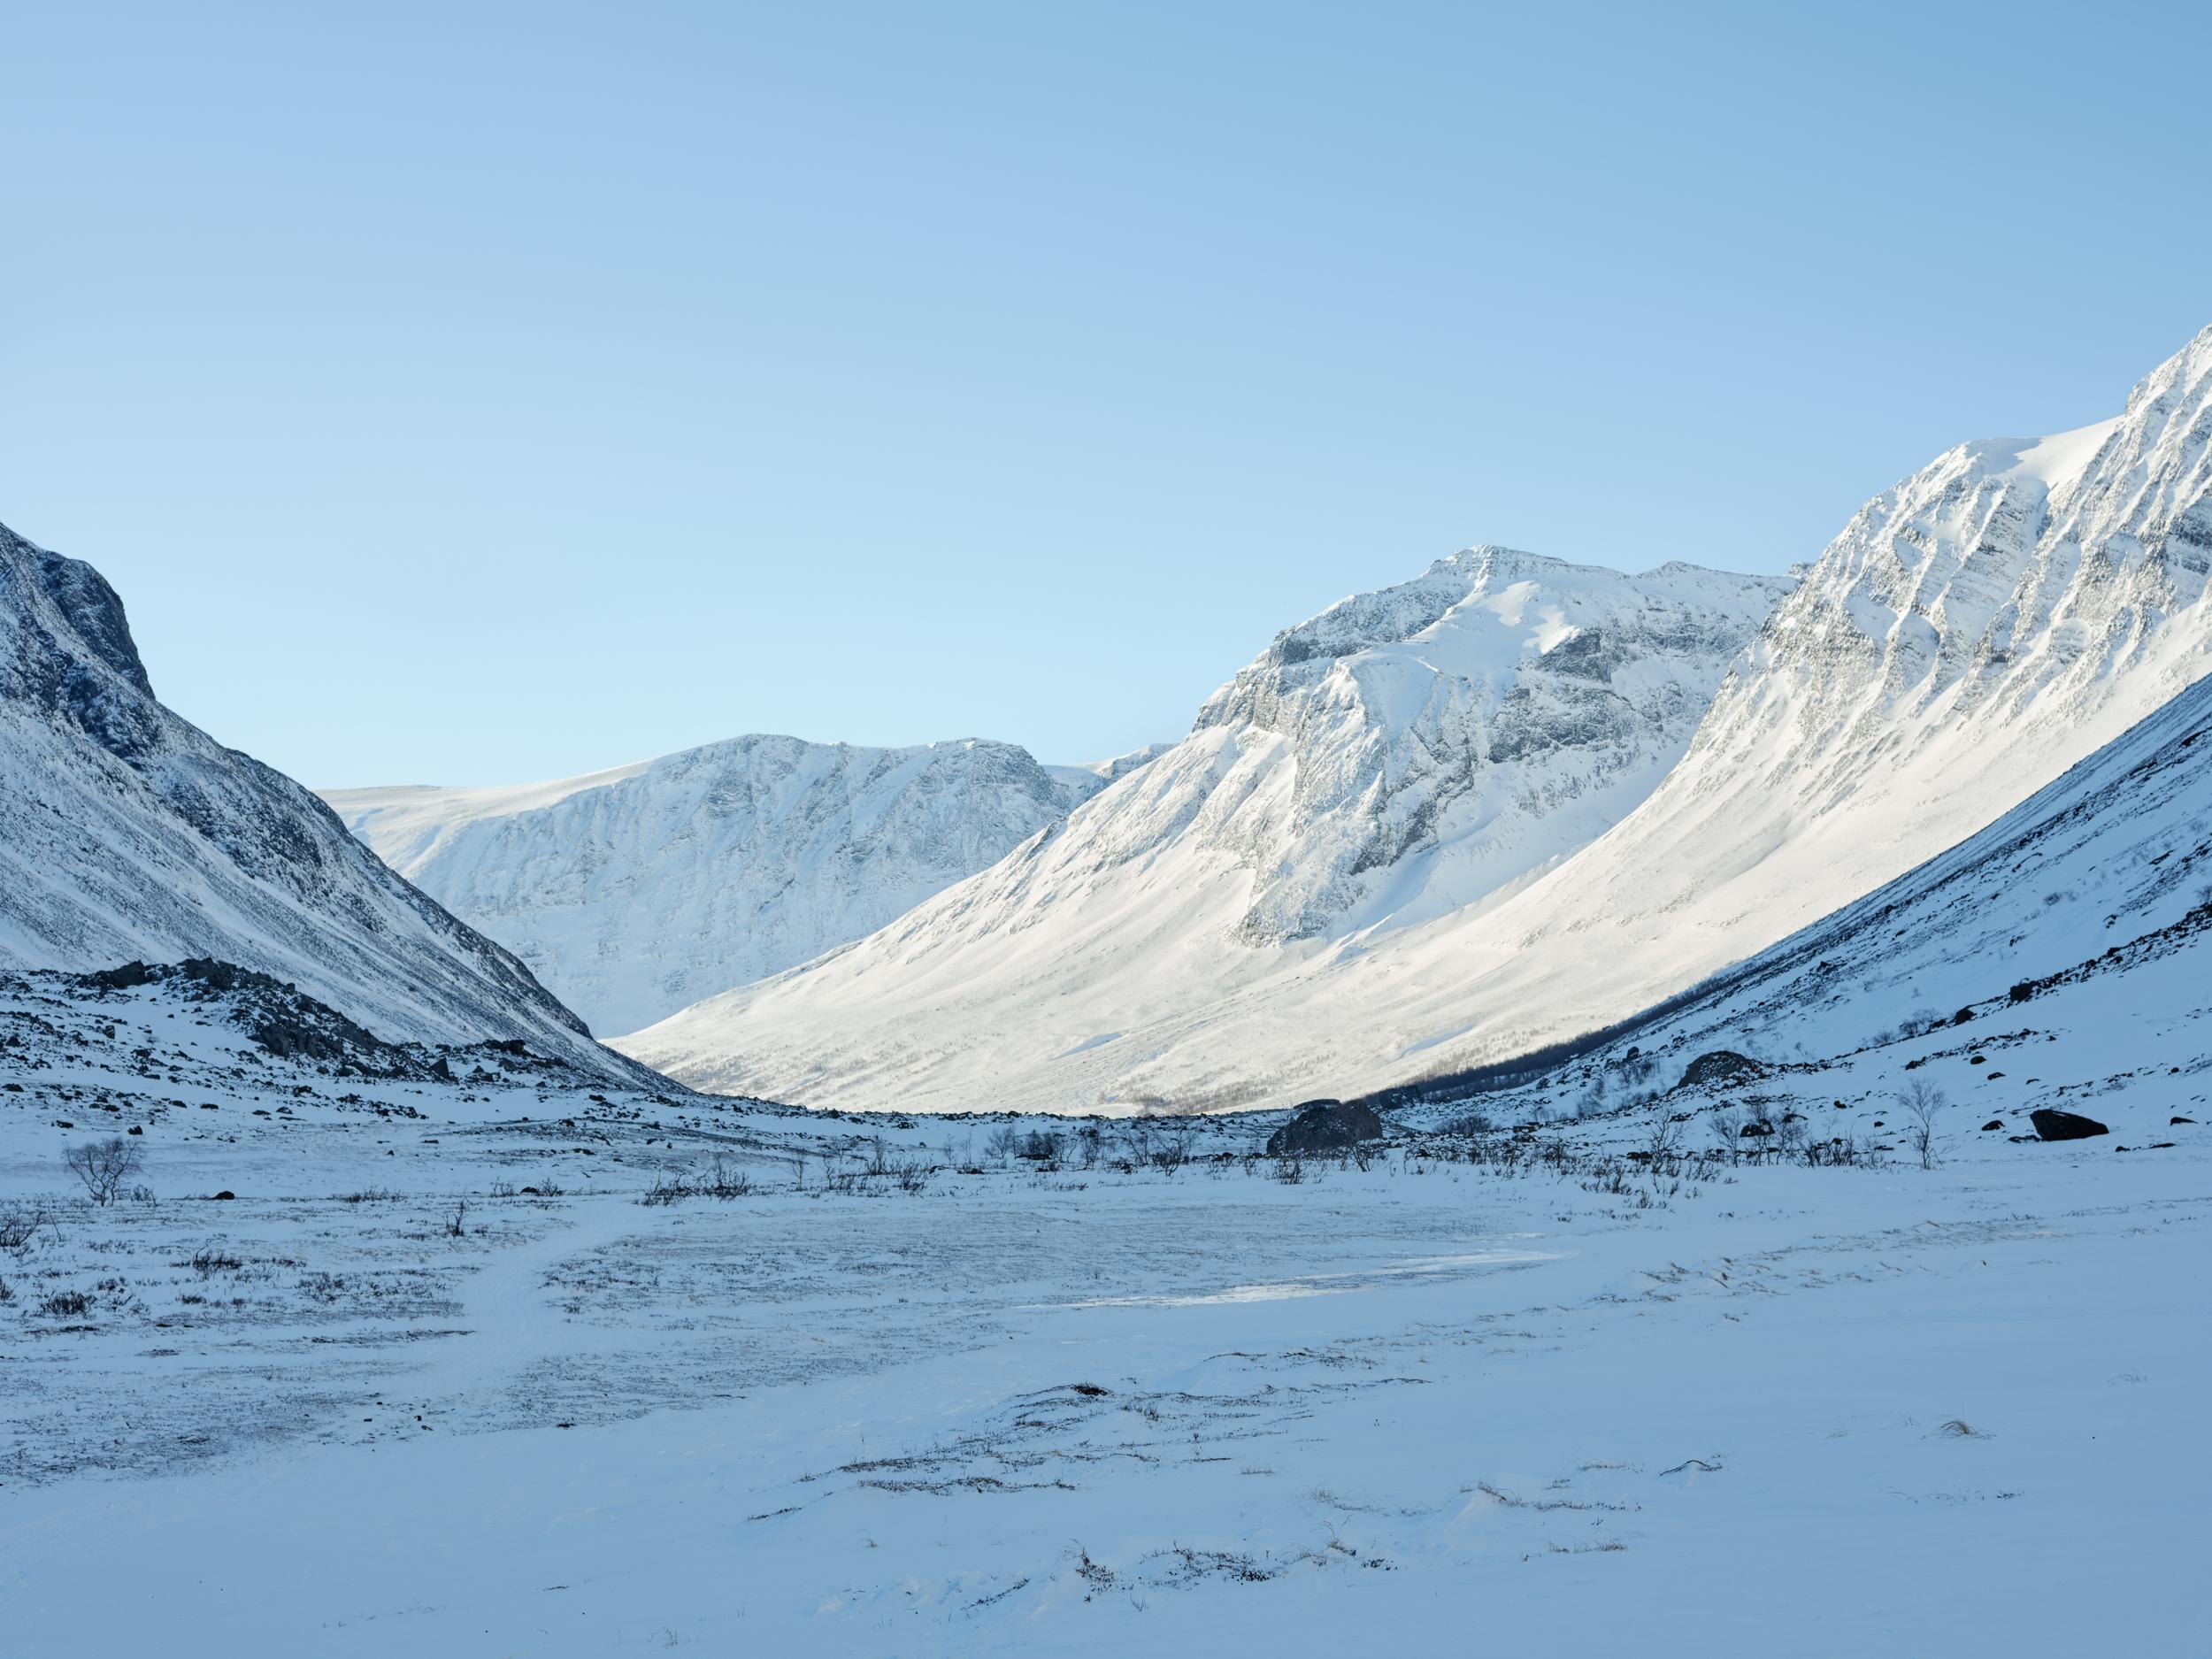 sgeo_20190329_Lappland_Winter_619.jpg